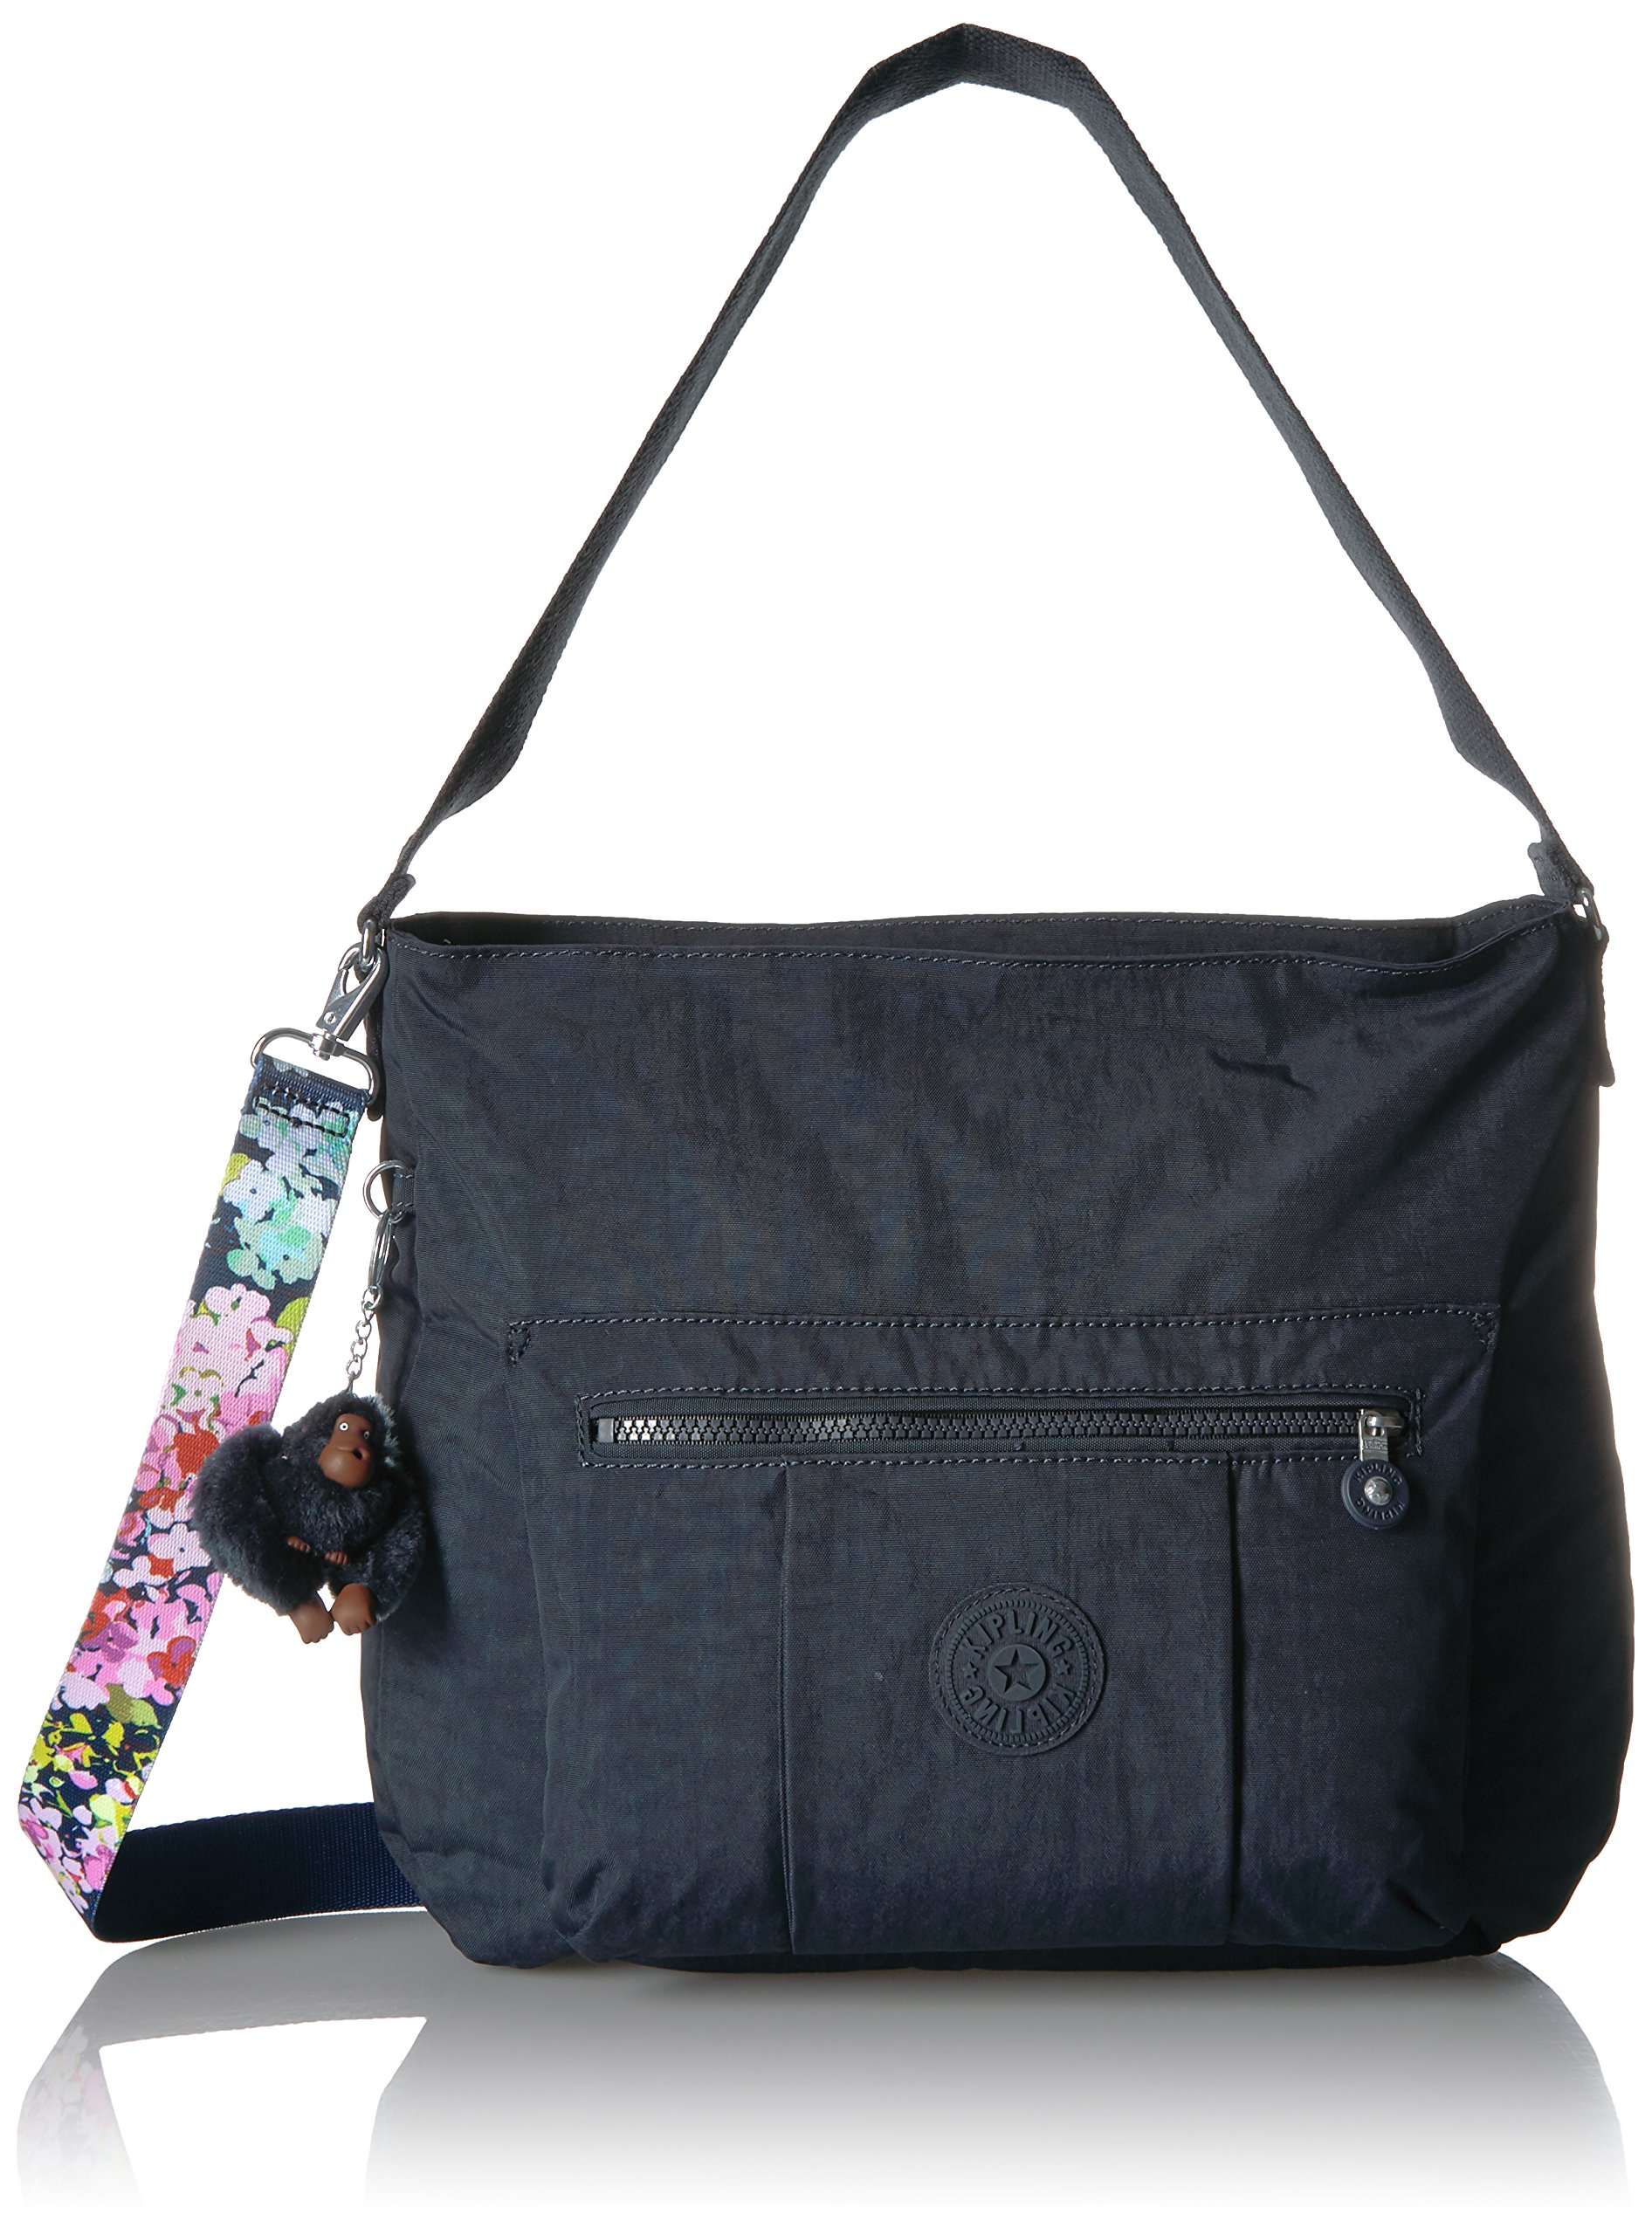 Kipling Carley Solid Hobo Crossbody Bag with a Floral Printed Strap, True Blue